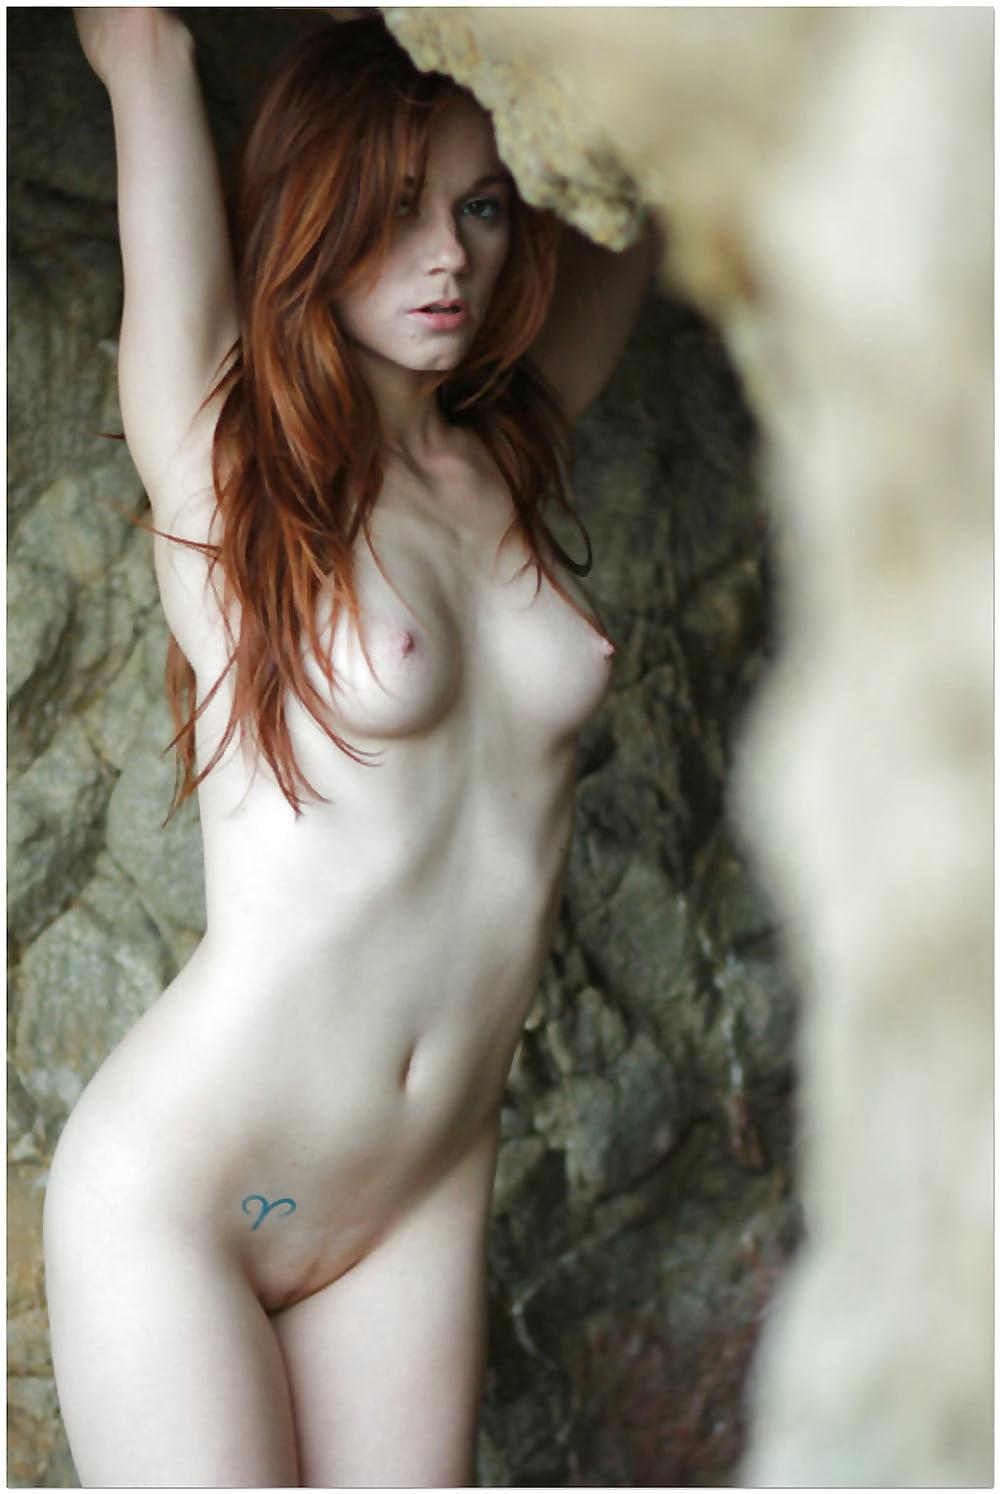 Sherilyn Fenn Nude As A Red Hair